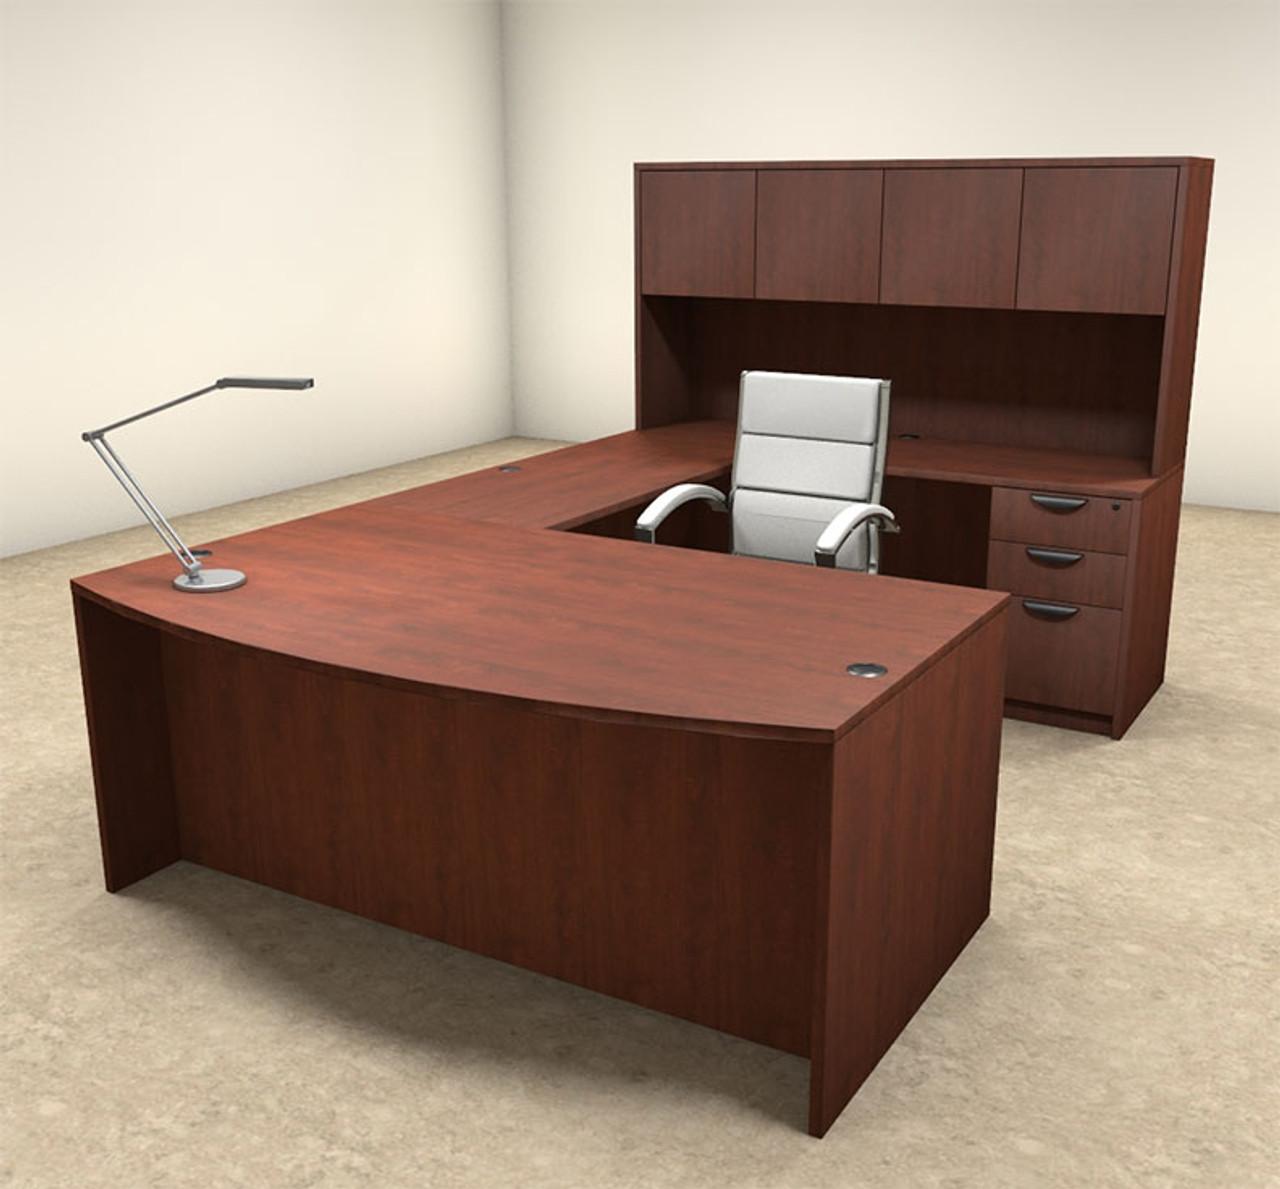 5pc U Shaped Modern Executive Office Desk, #OT-SUL-U14